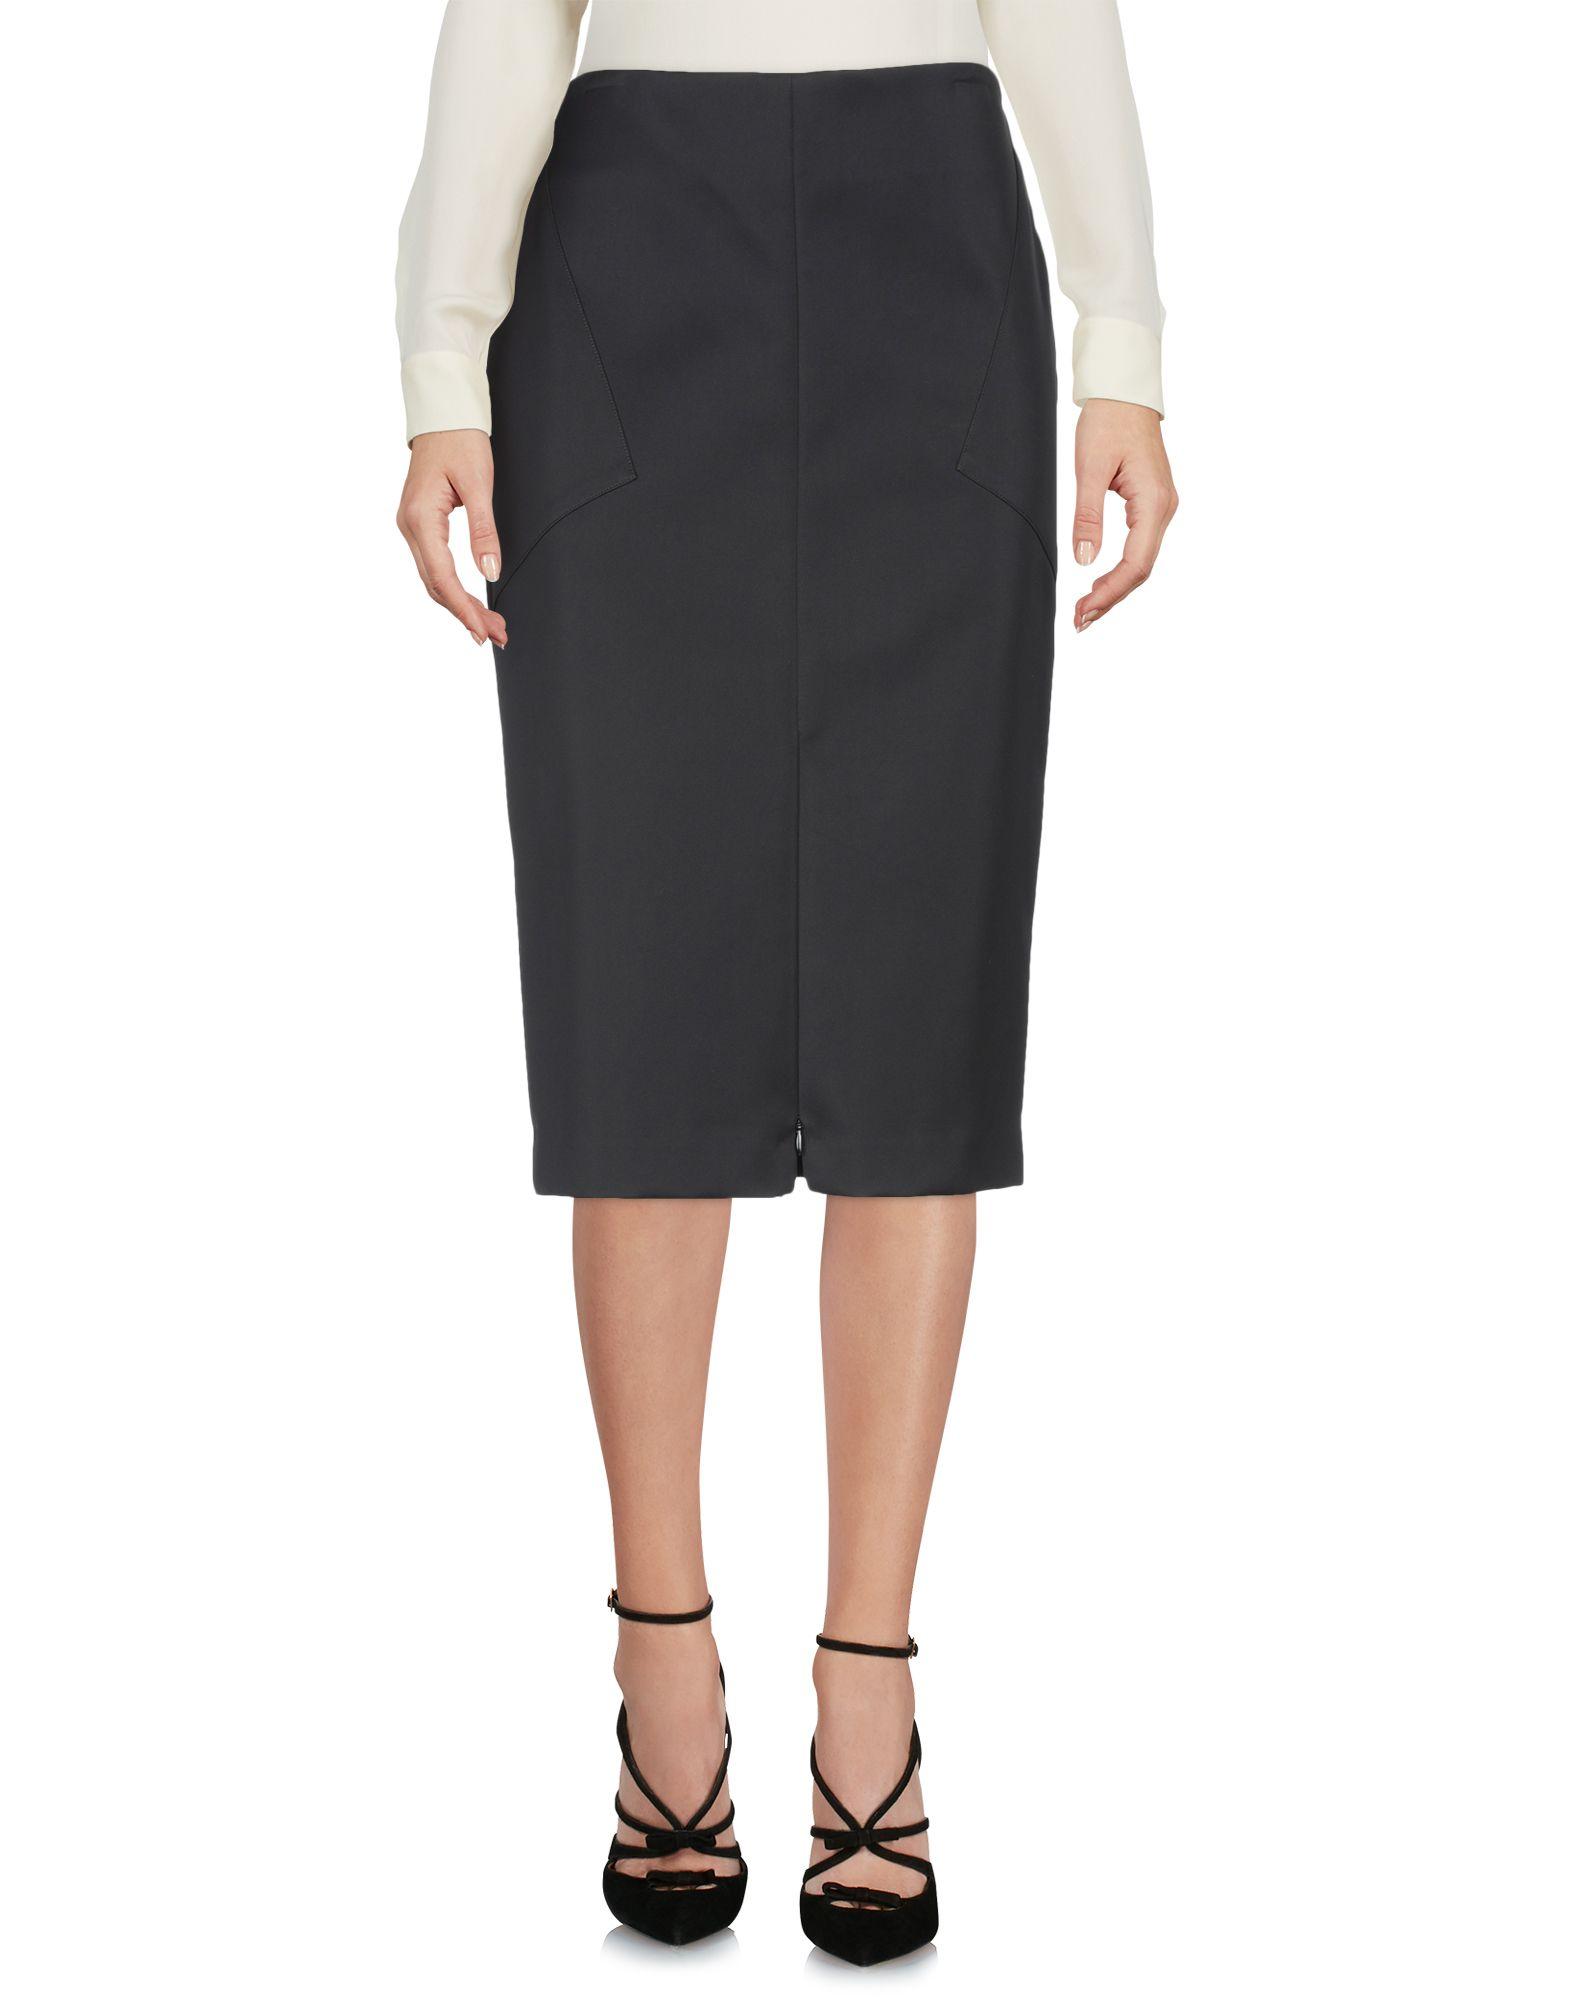 PROTAGONIST Midi Skirts in Black